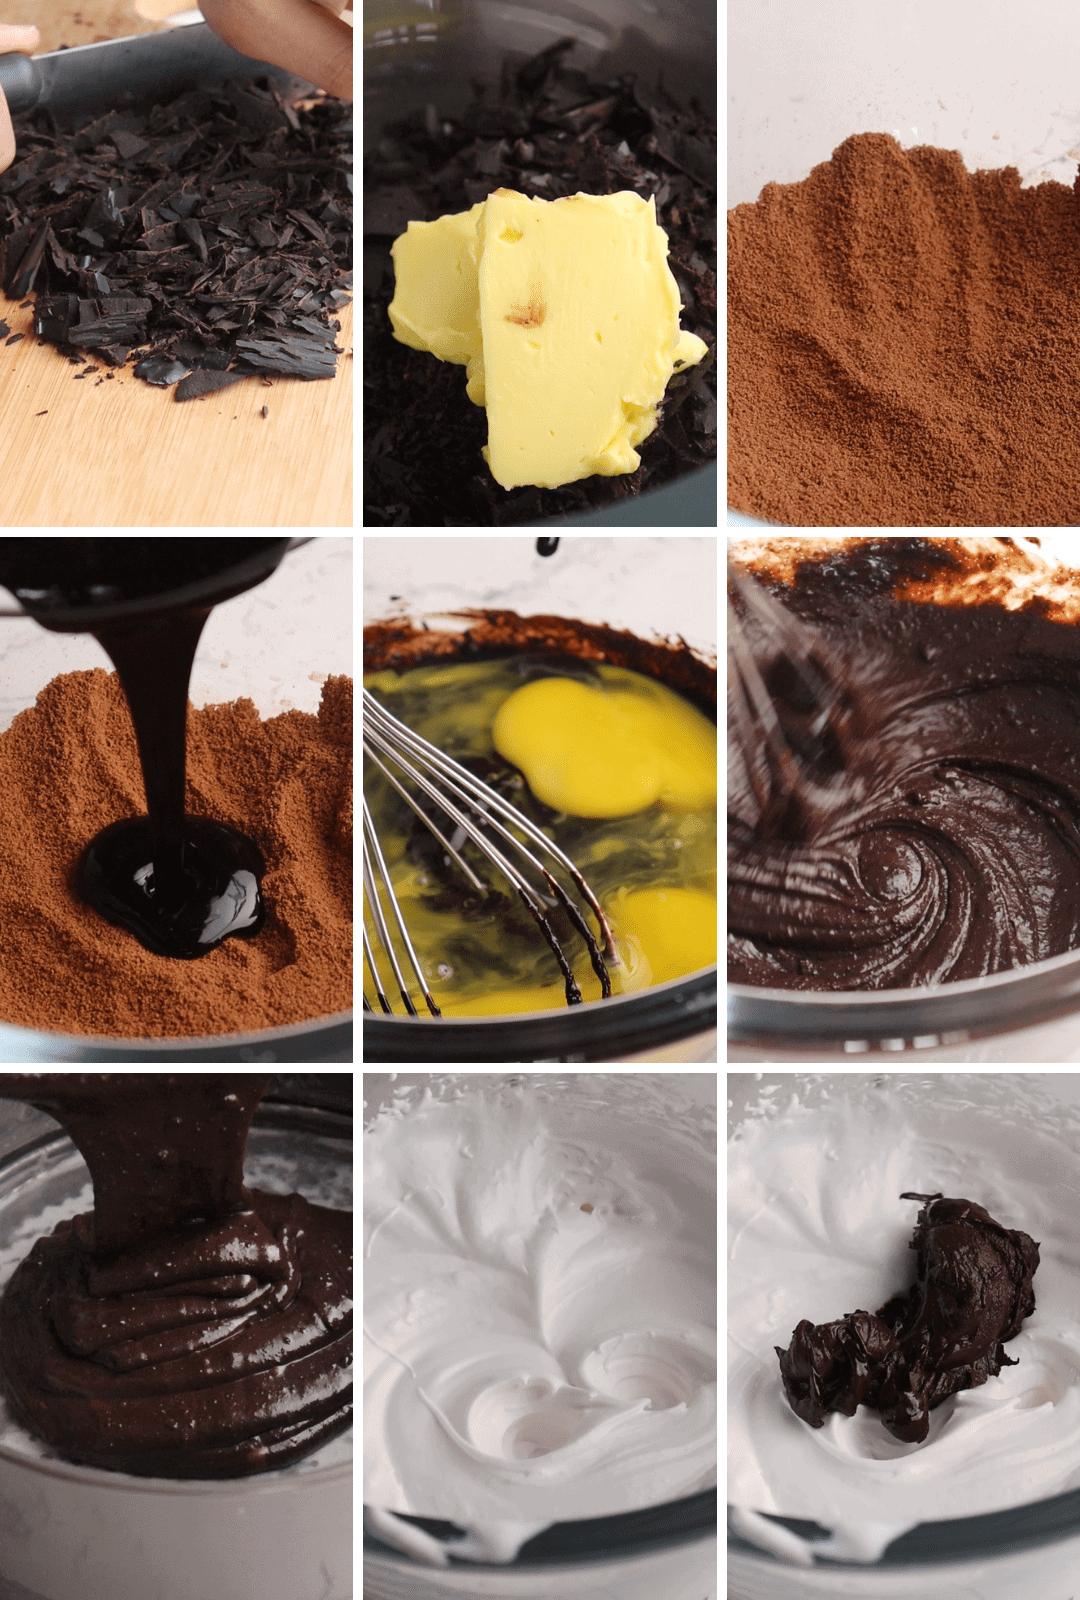 keto-low-carb-chocolate-cake-procedure-collage-thehealthcreative